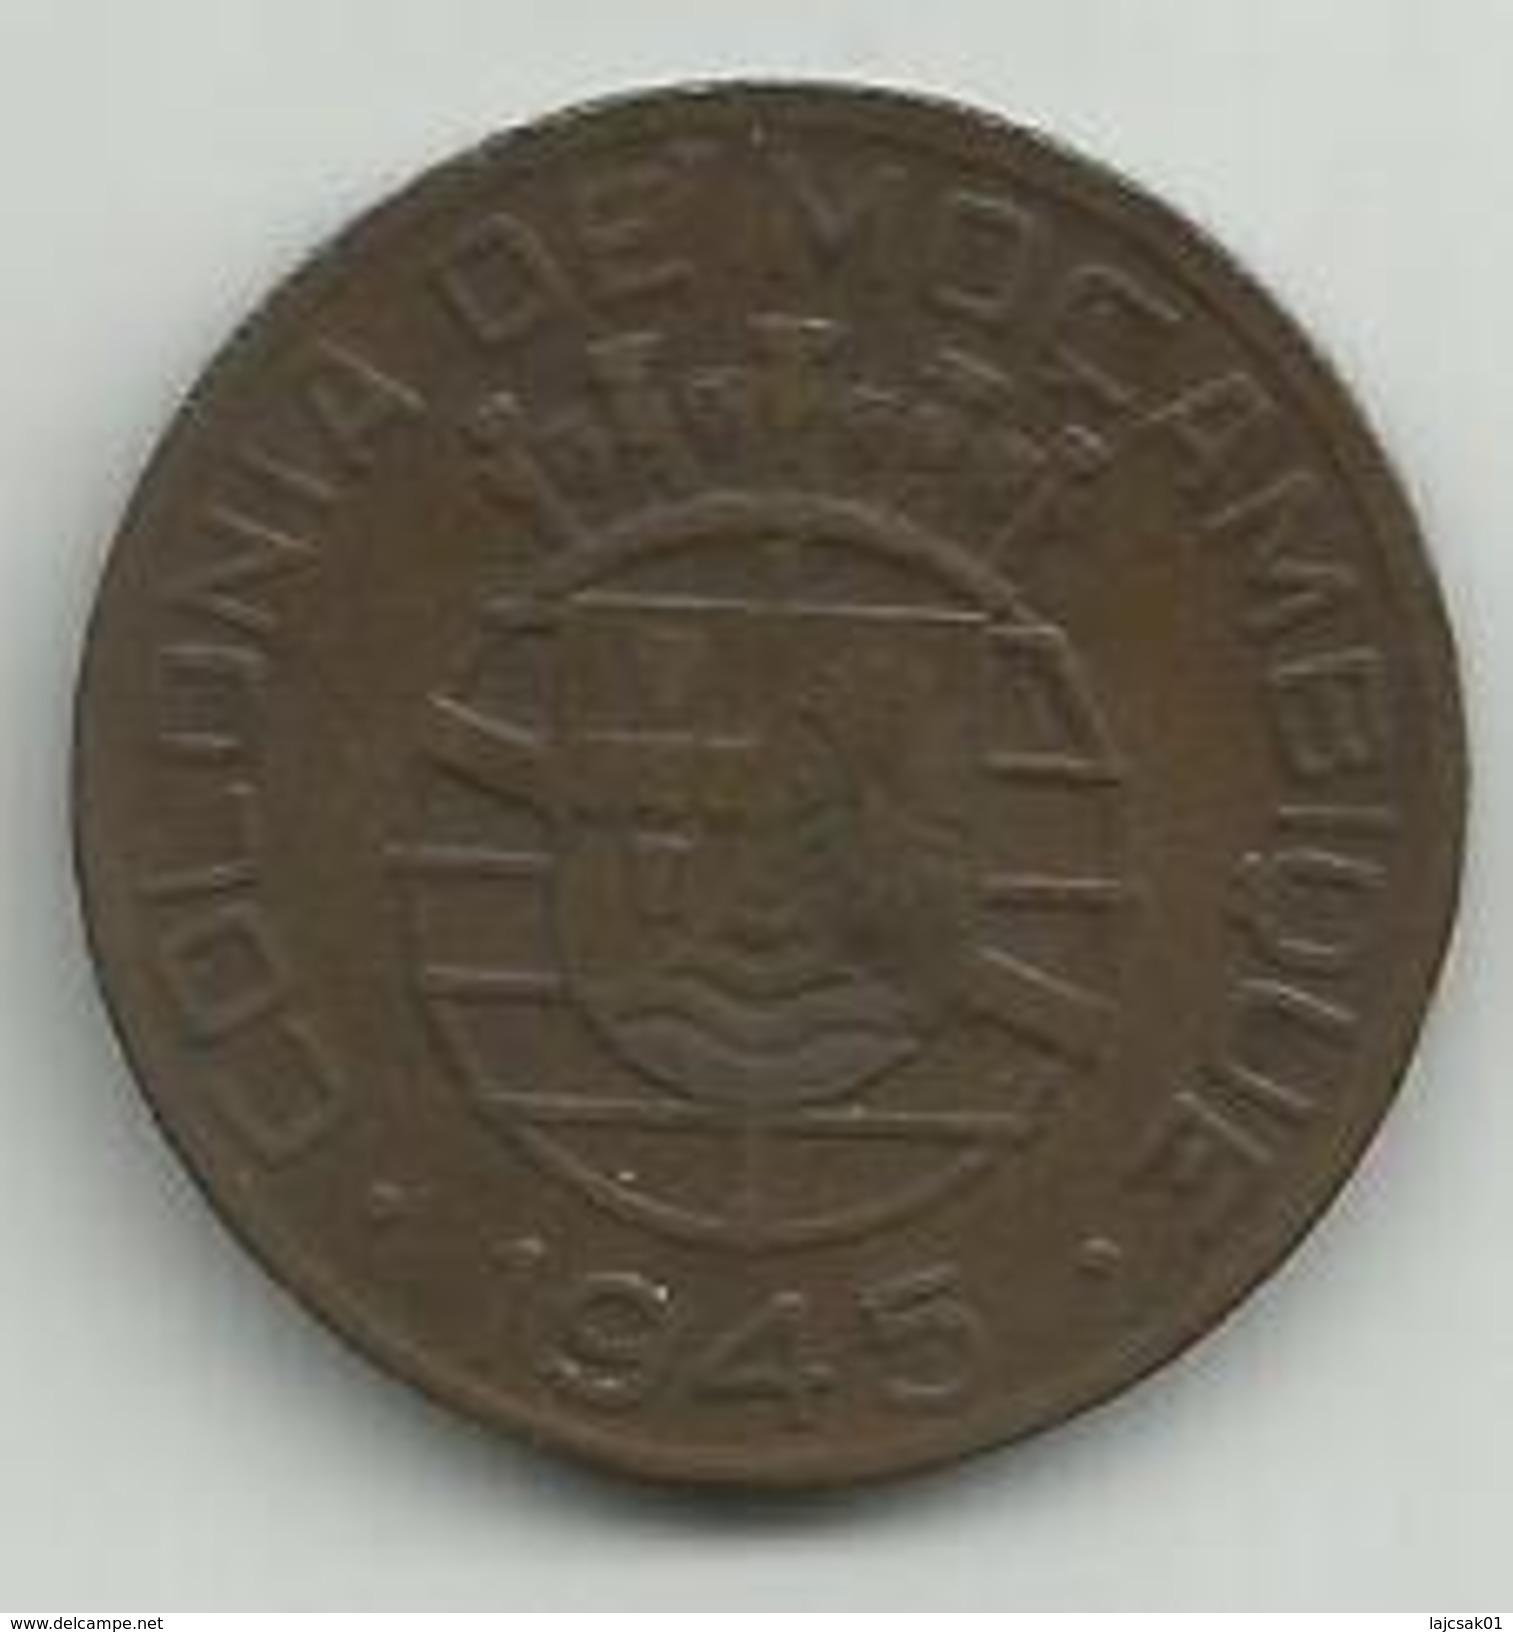 Mozambique 1 Escudo 1945. KM#74 - Mozambique